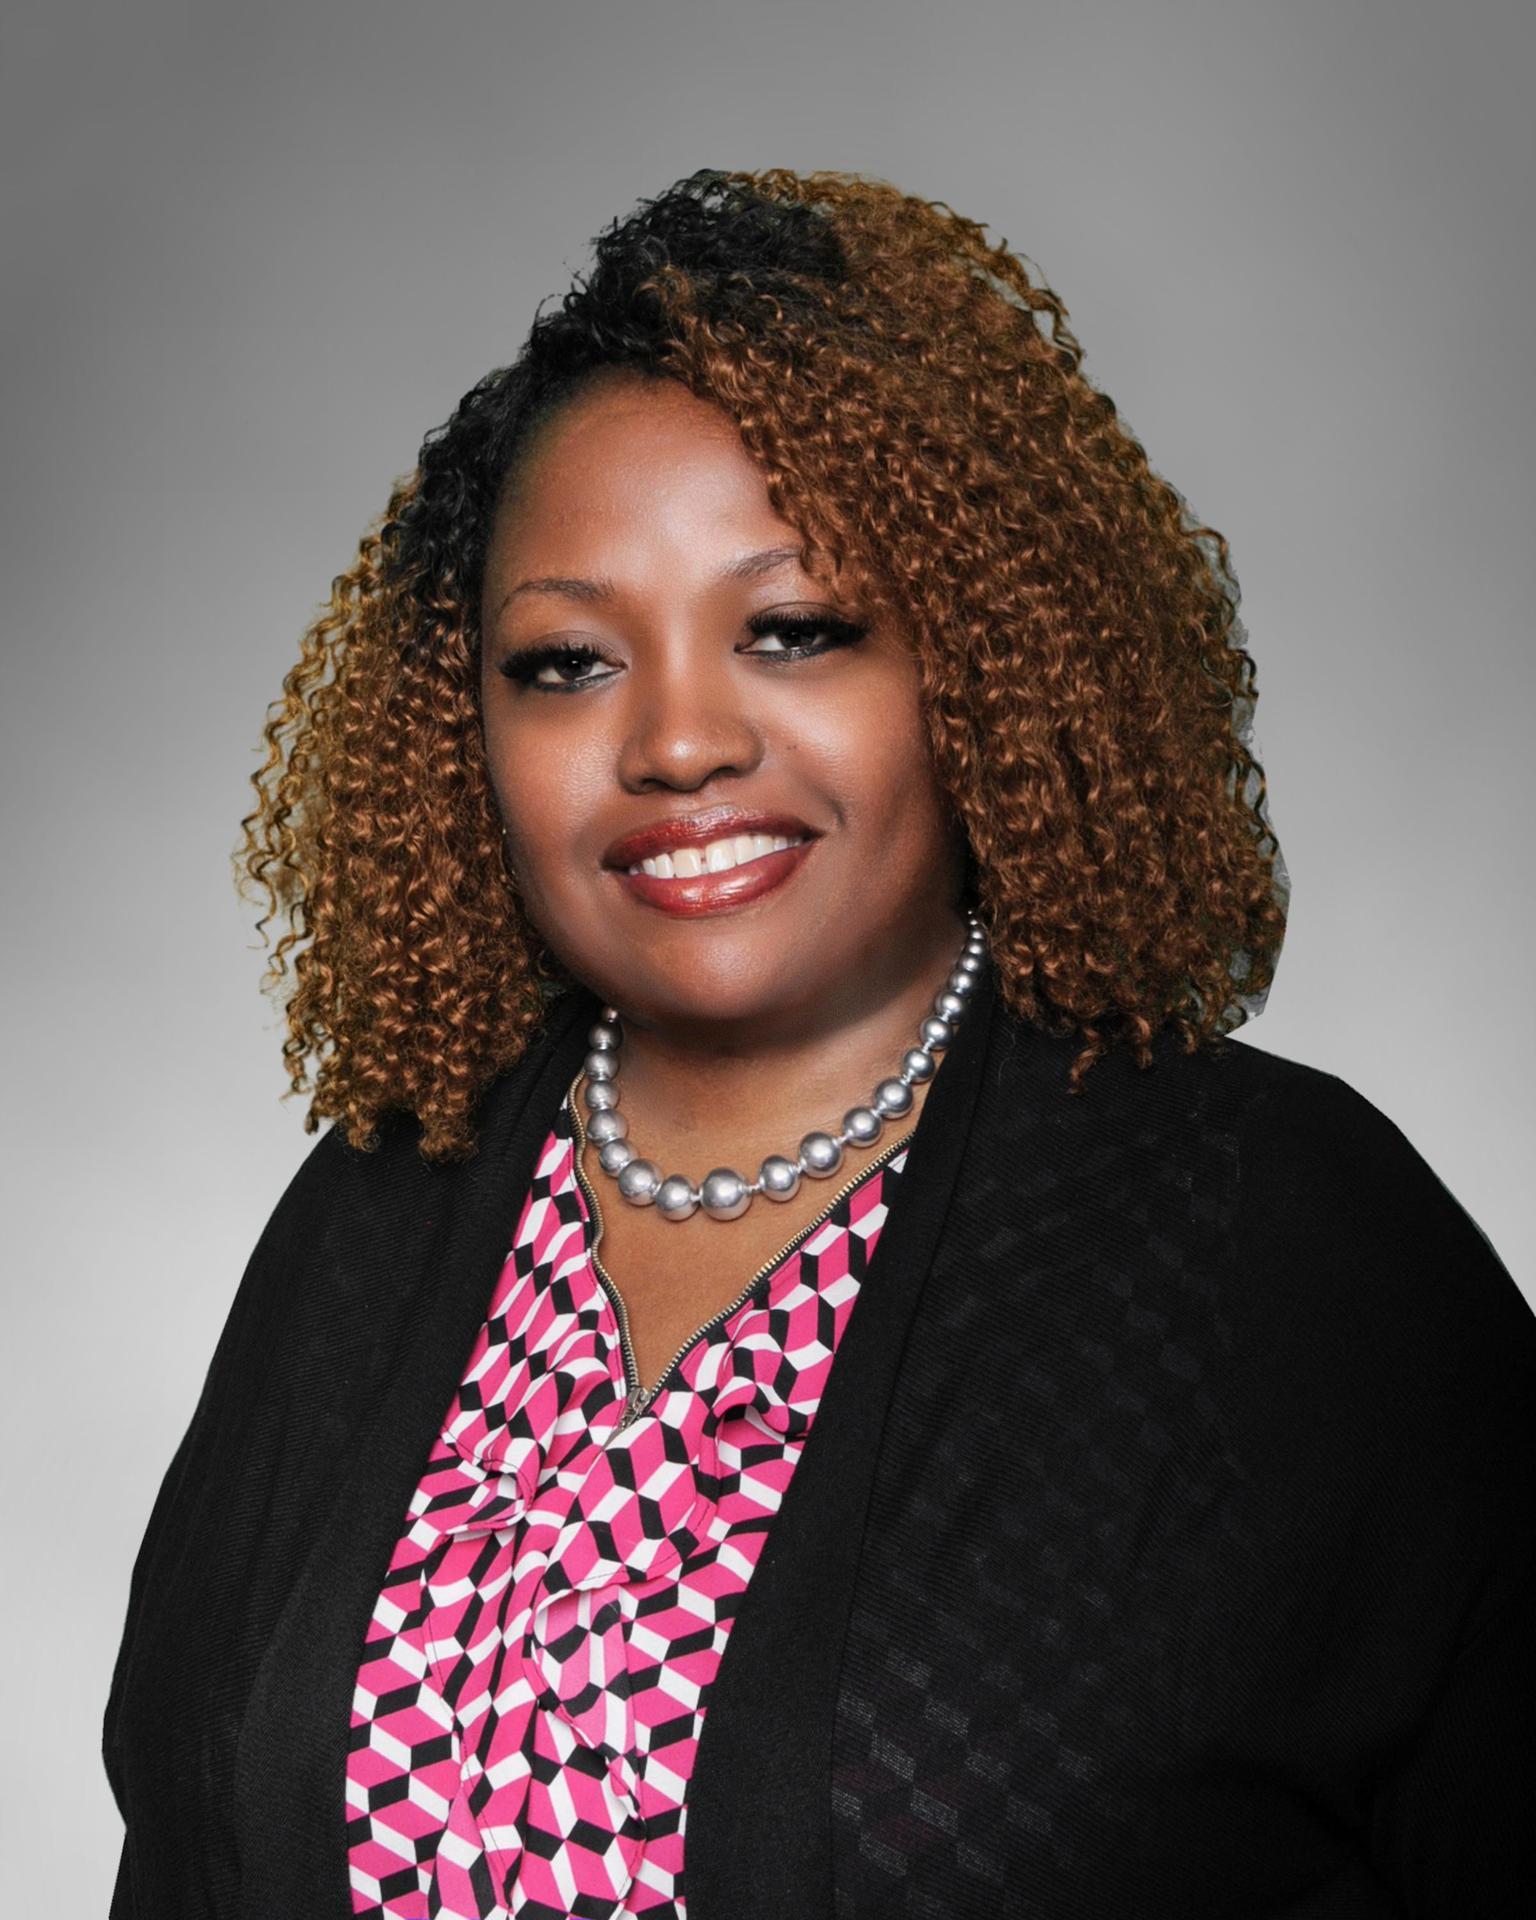 Ms. Veronica Smith